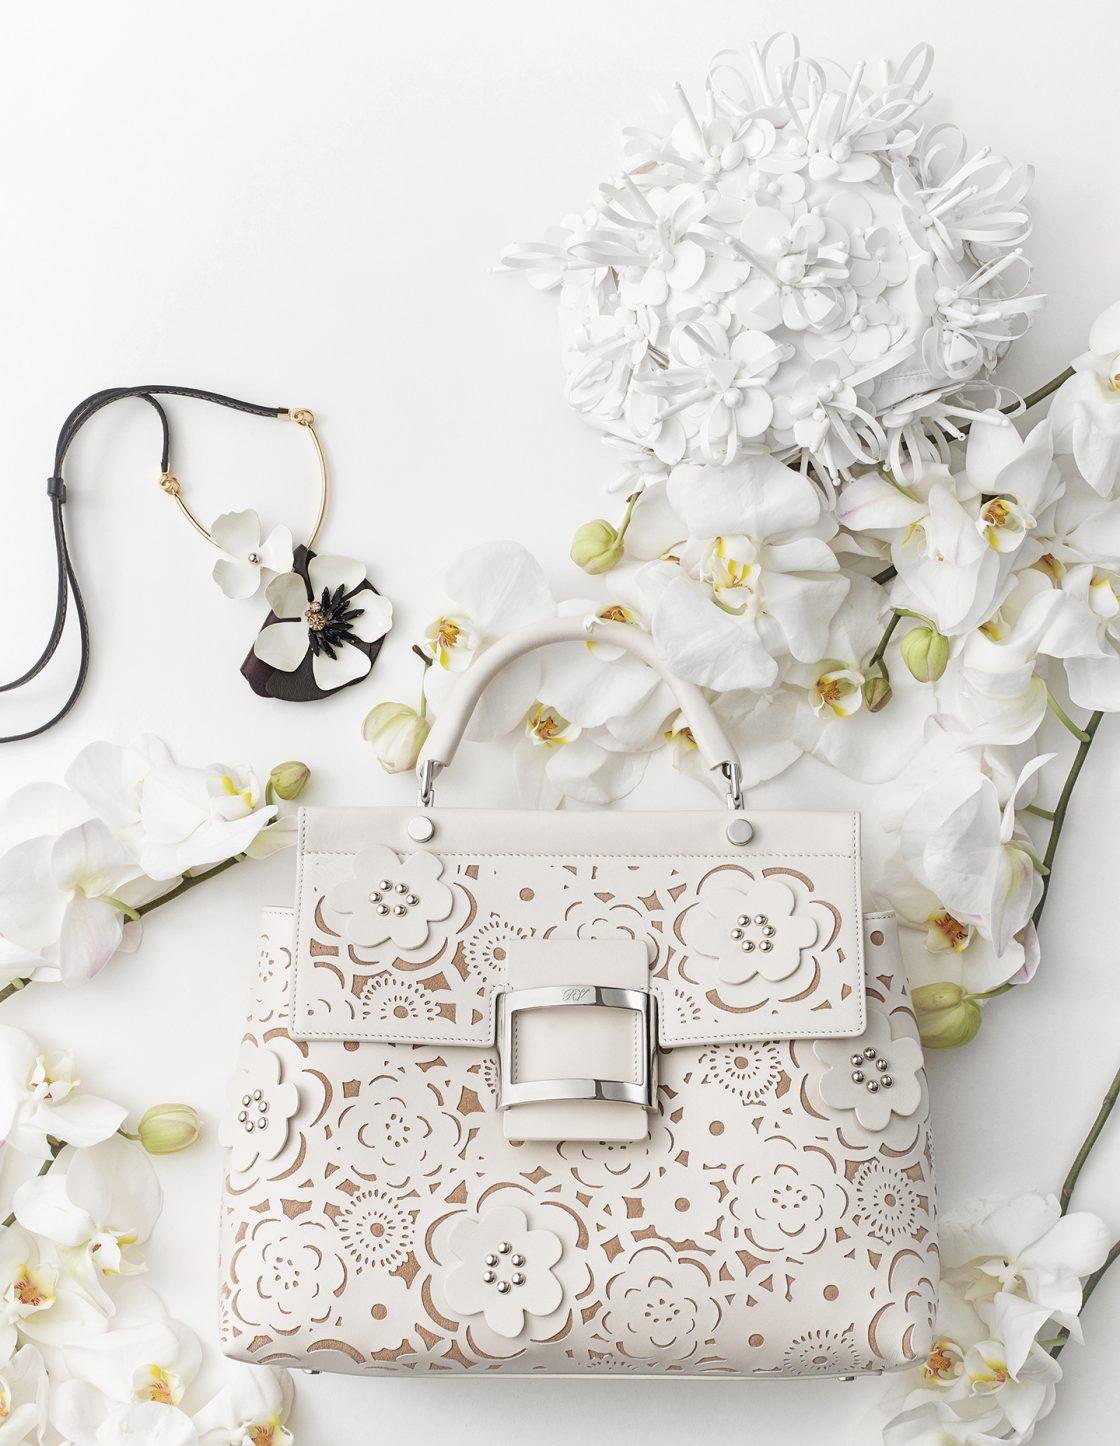 White Blossom - 하퍼스 바자 코리아 2017년 3월호